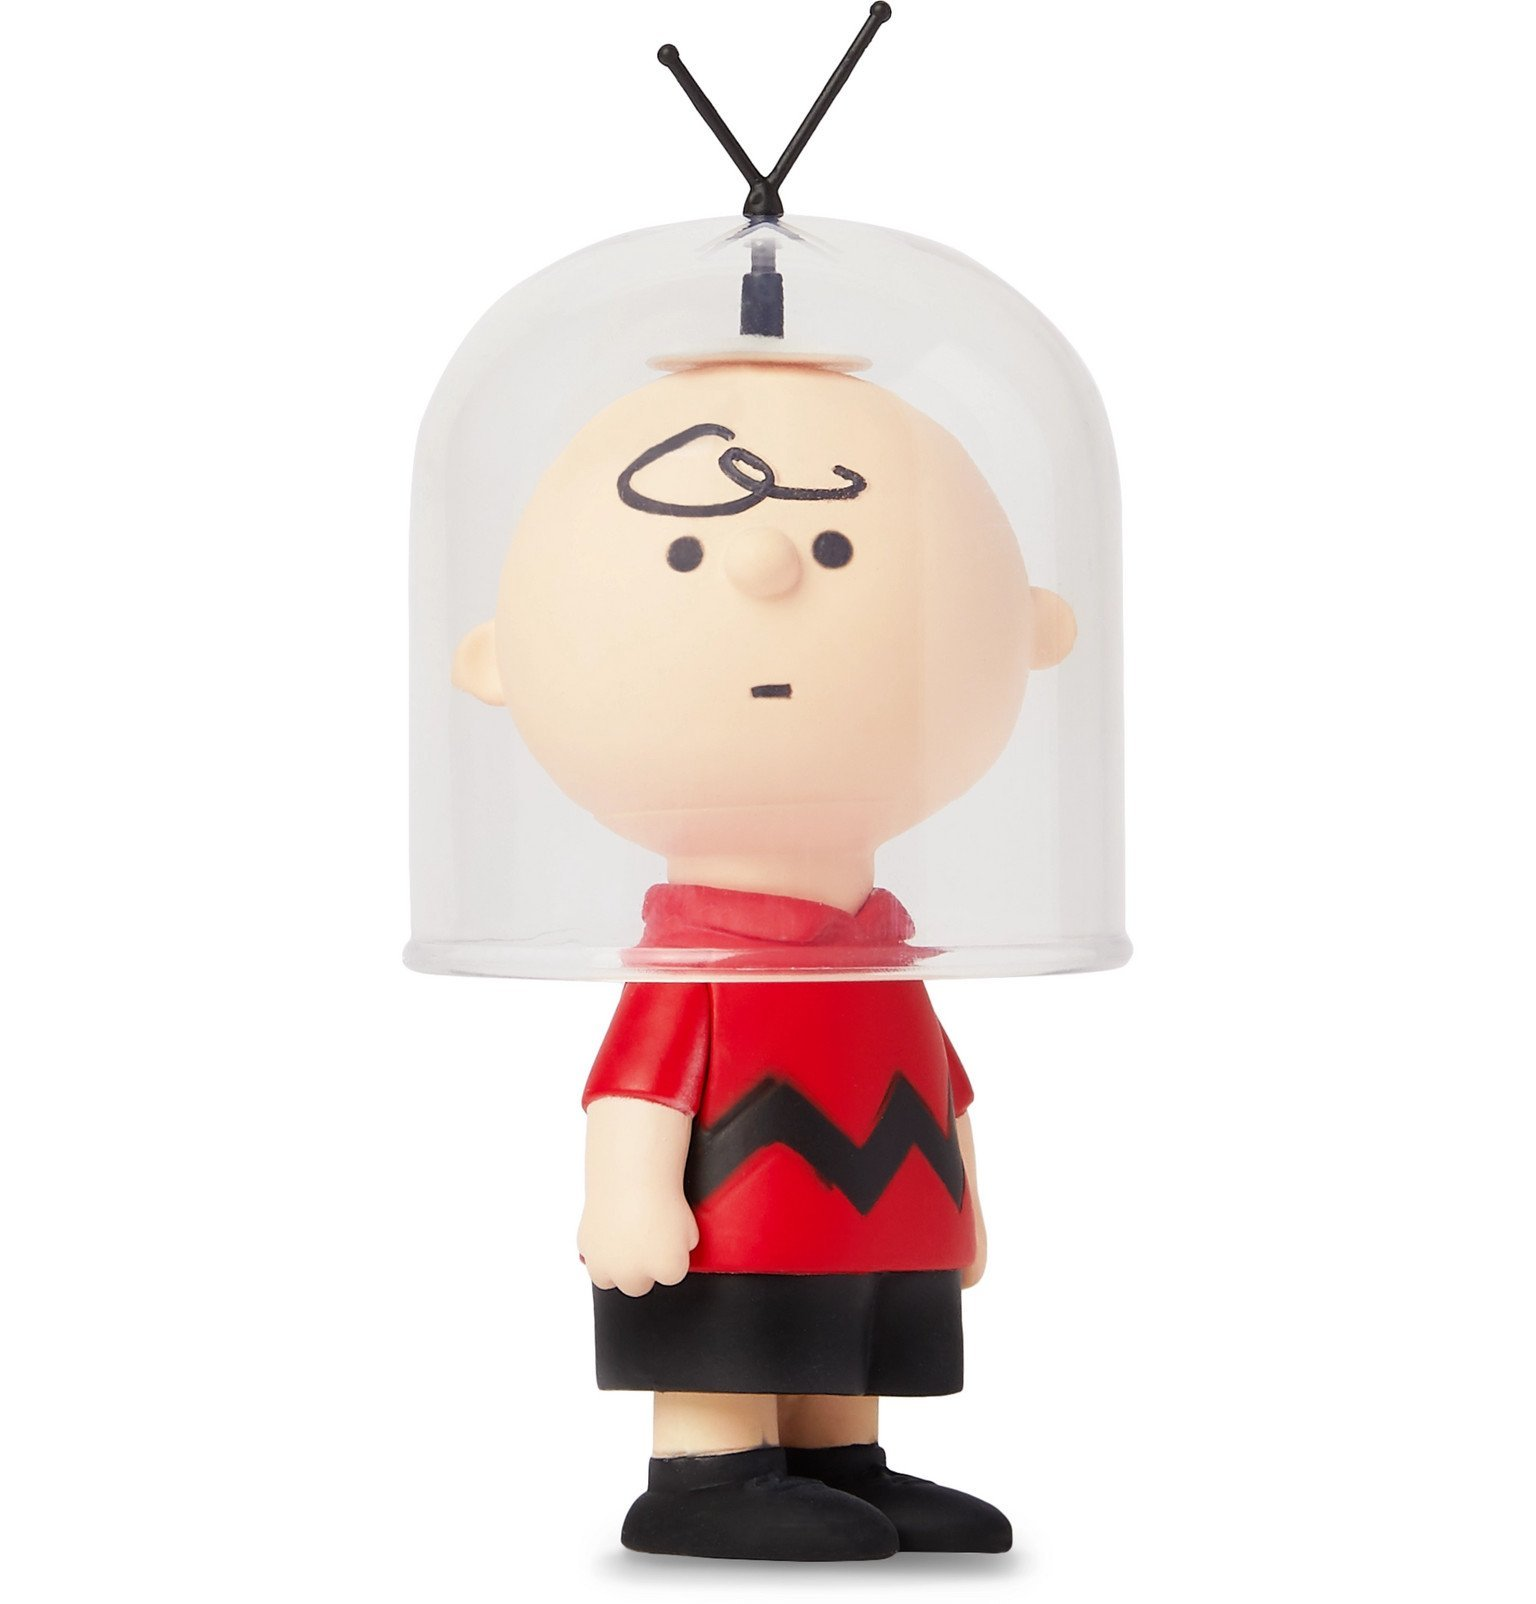 Photo: Medicom - Ultra Detail Figure No.492 Astronaut Charlie Brown - Multi